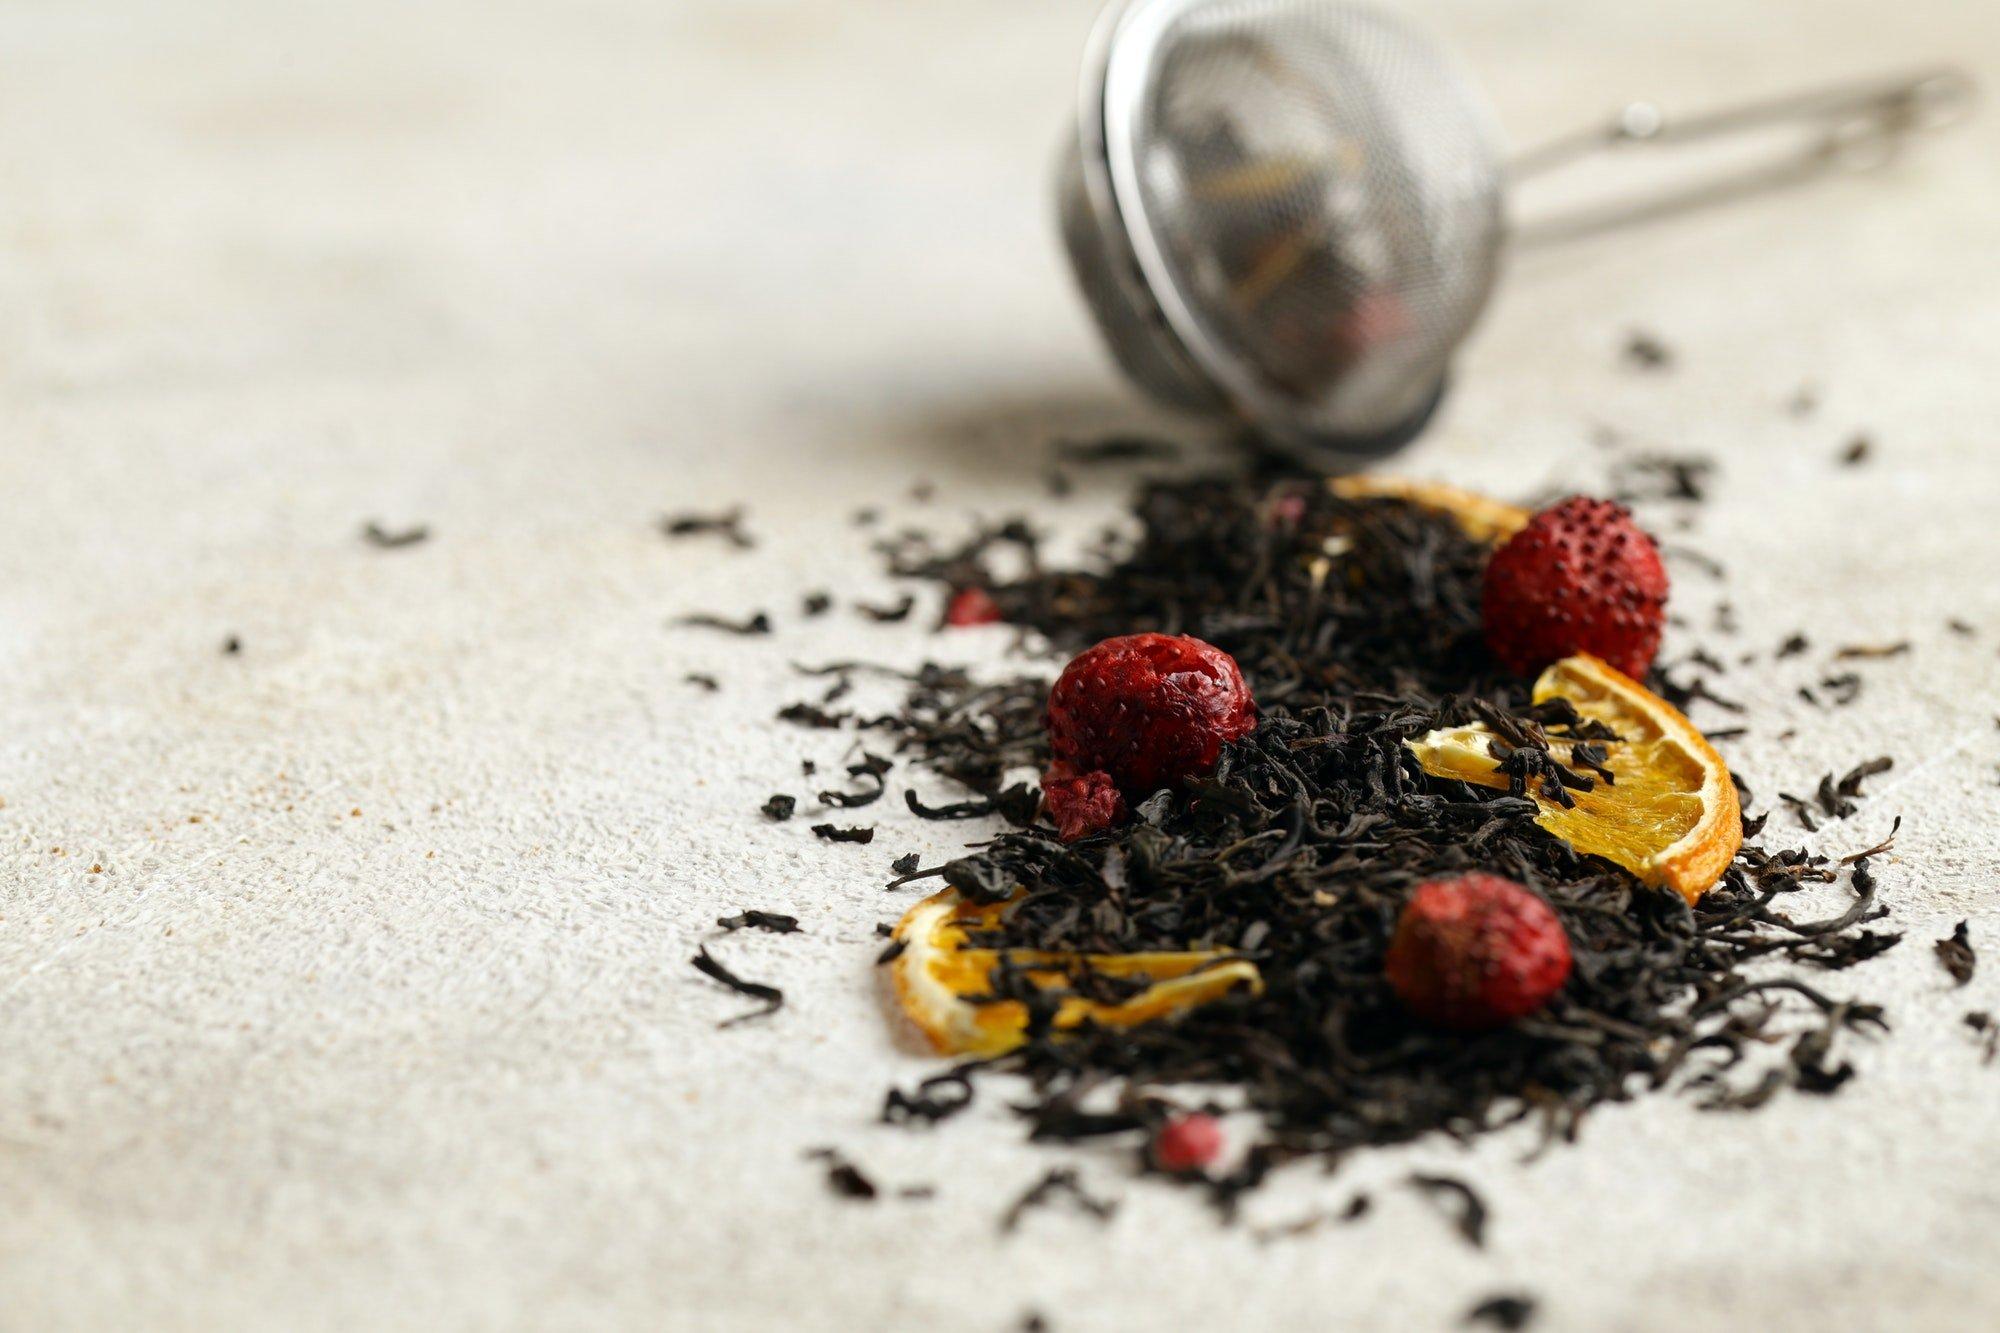 Black Tea with Berries